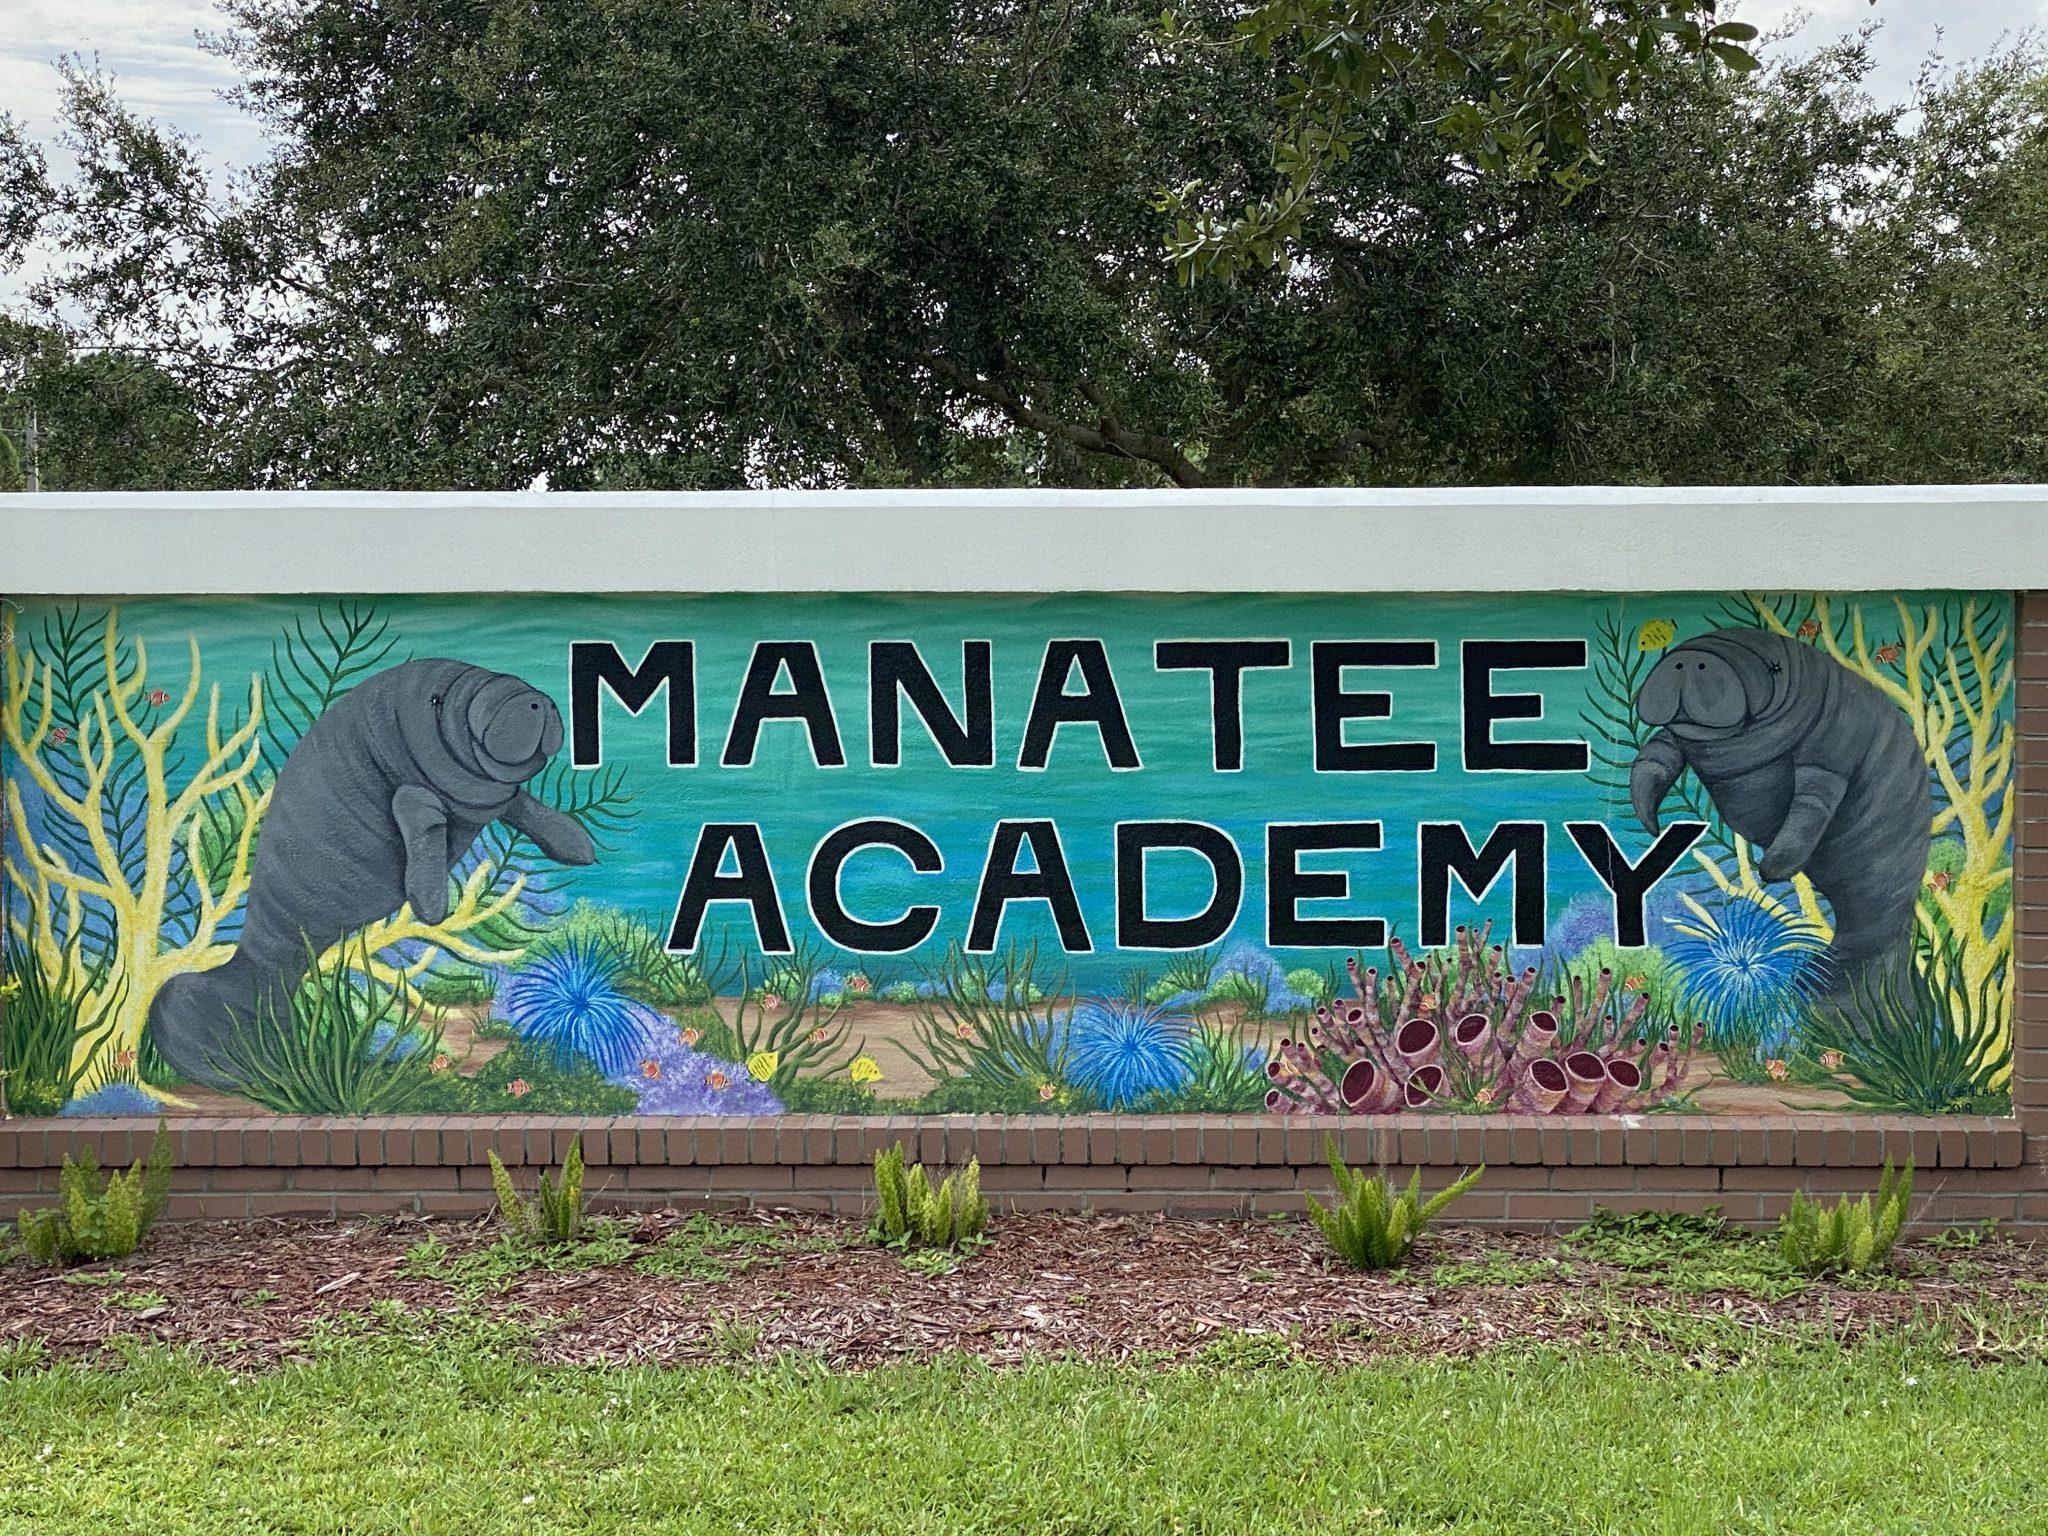 MANATEE ACADEMY K8